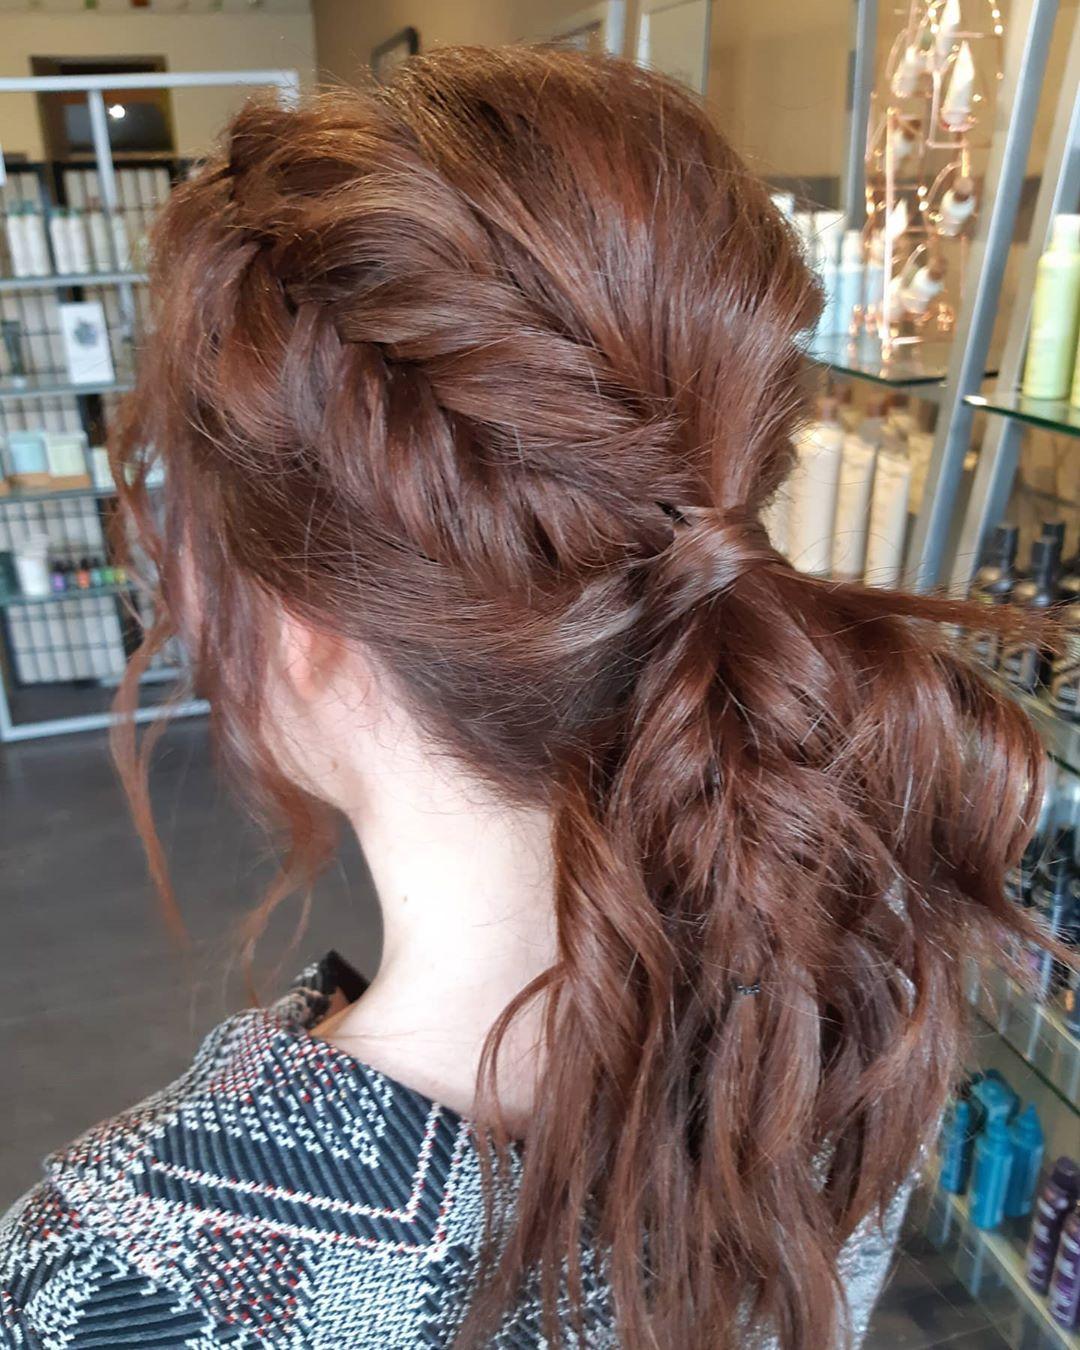 Elegant Dutch Fishtail Braid style